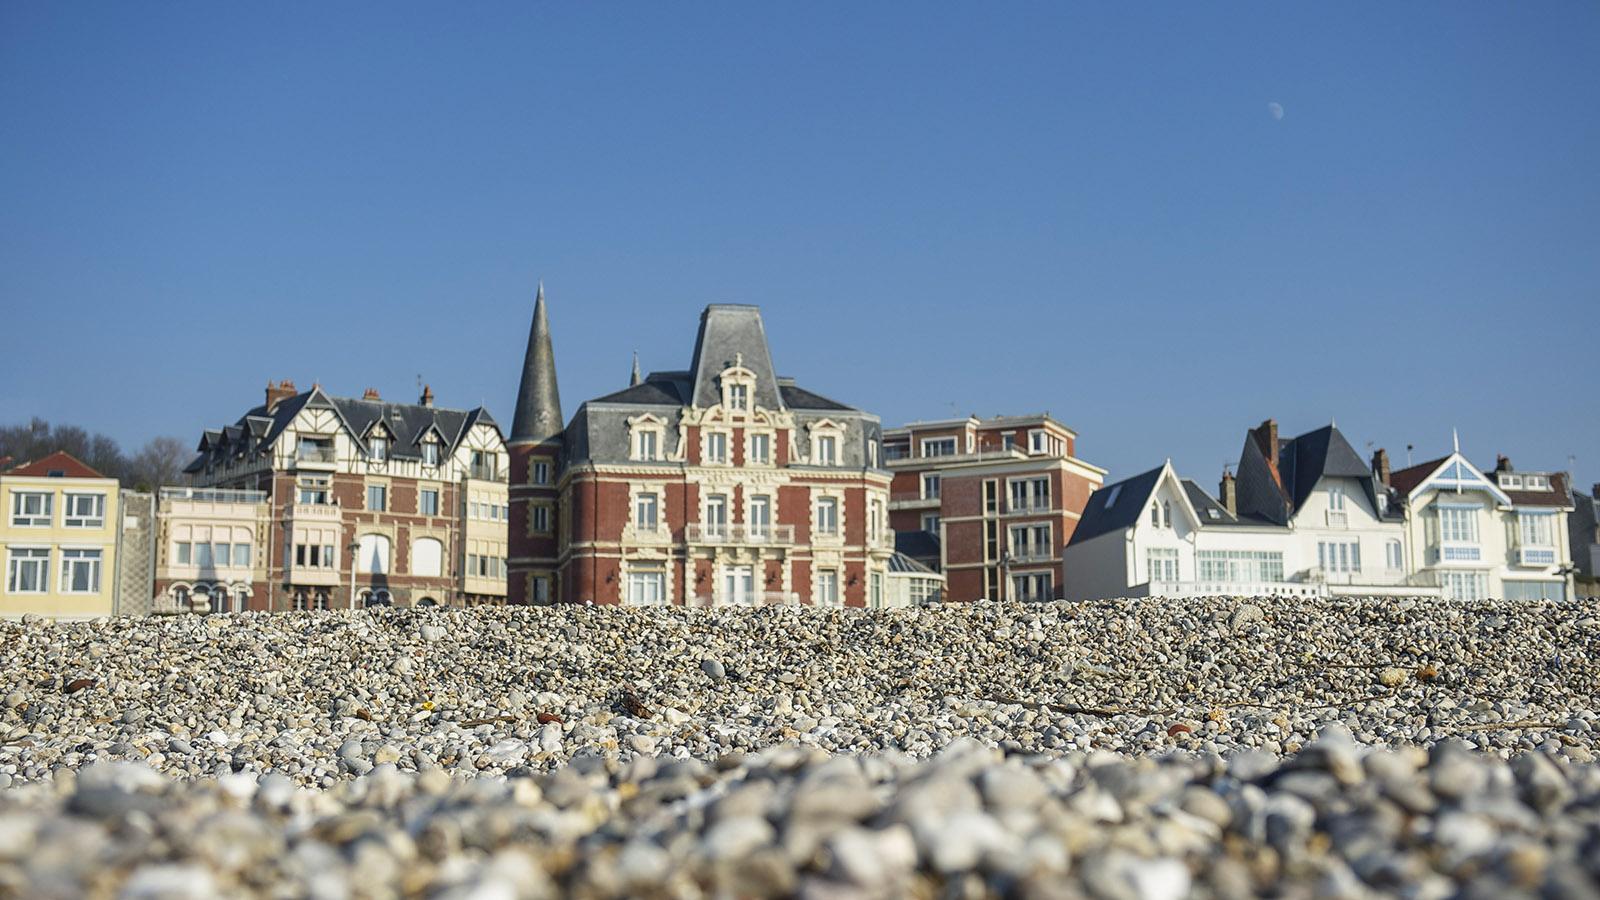 Le Havre: Strandvillen der Belle Époque säumen den Kiesstrand. Foto: Hilke Maunder